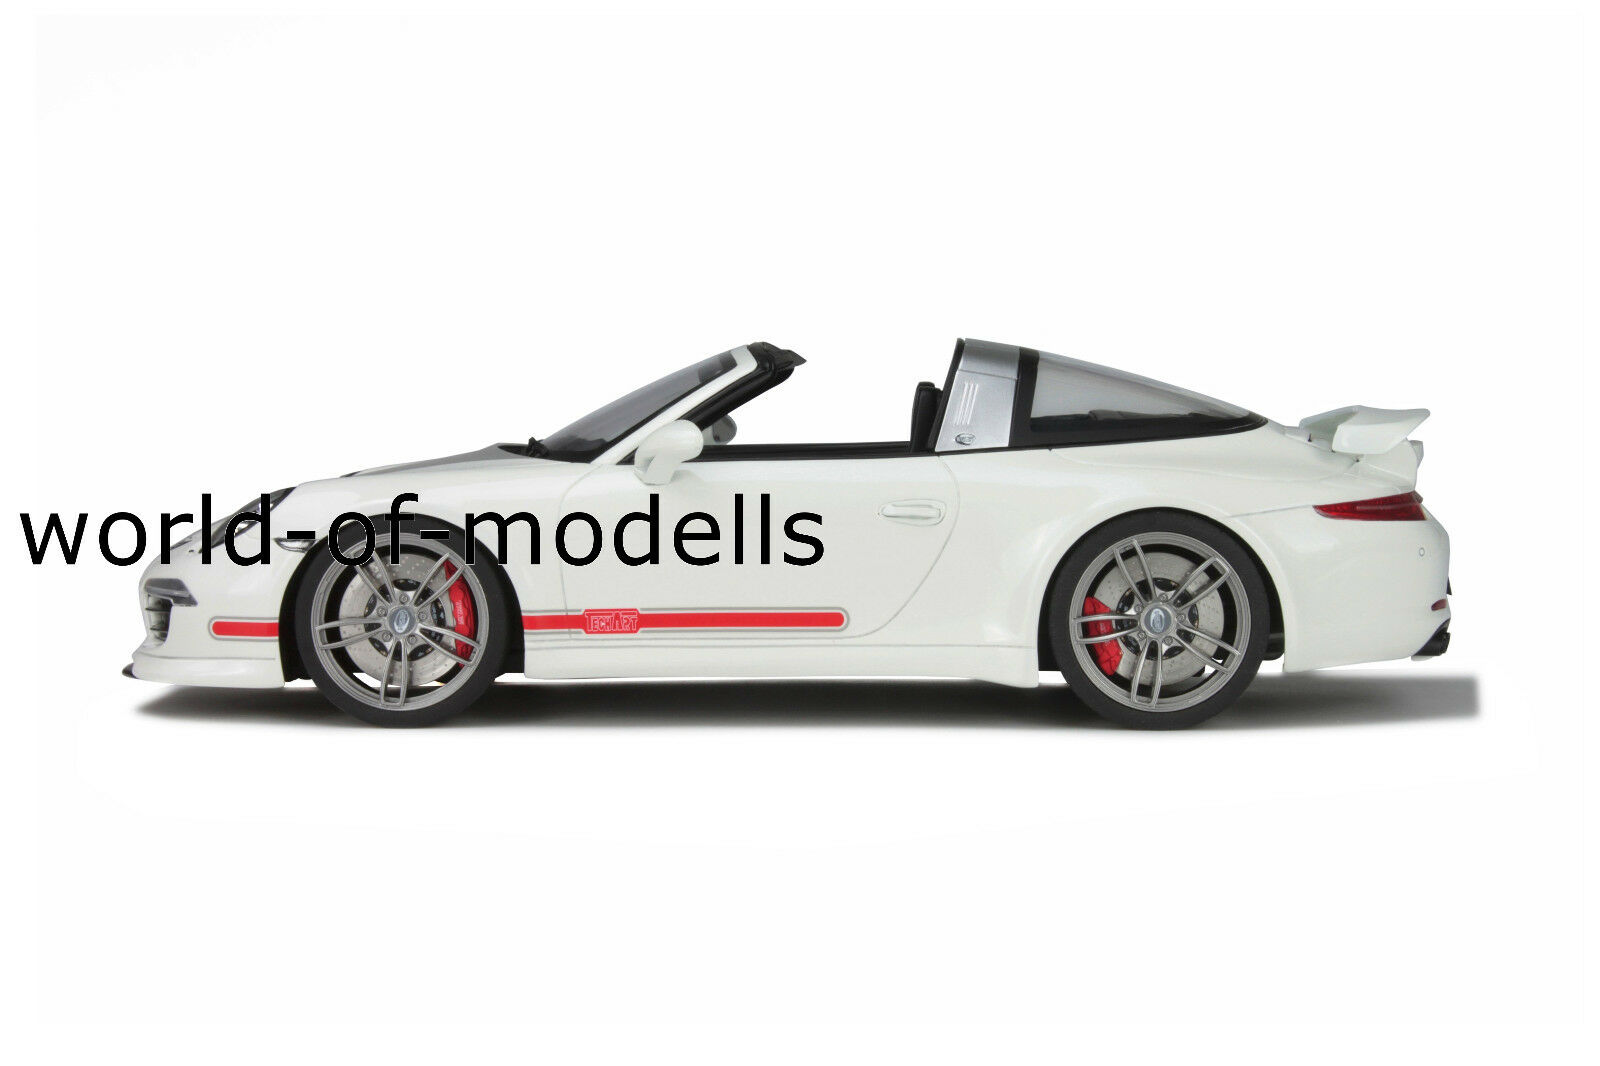 GT Spirit 108 PORSCHE 911 991 TechArt TARGA BIANCO 2014 1 18 NUOVO IN SCATOLA ORIGINALE